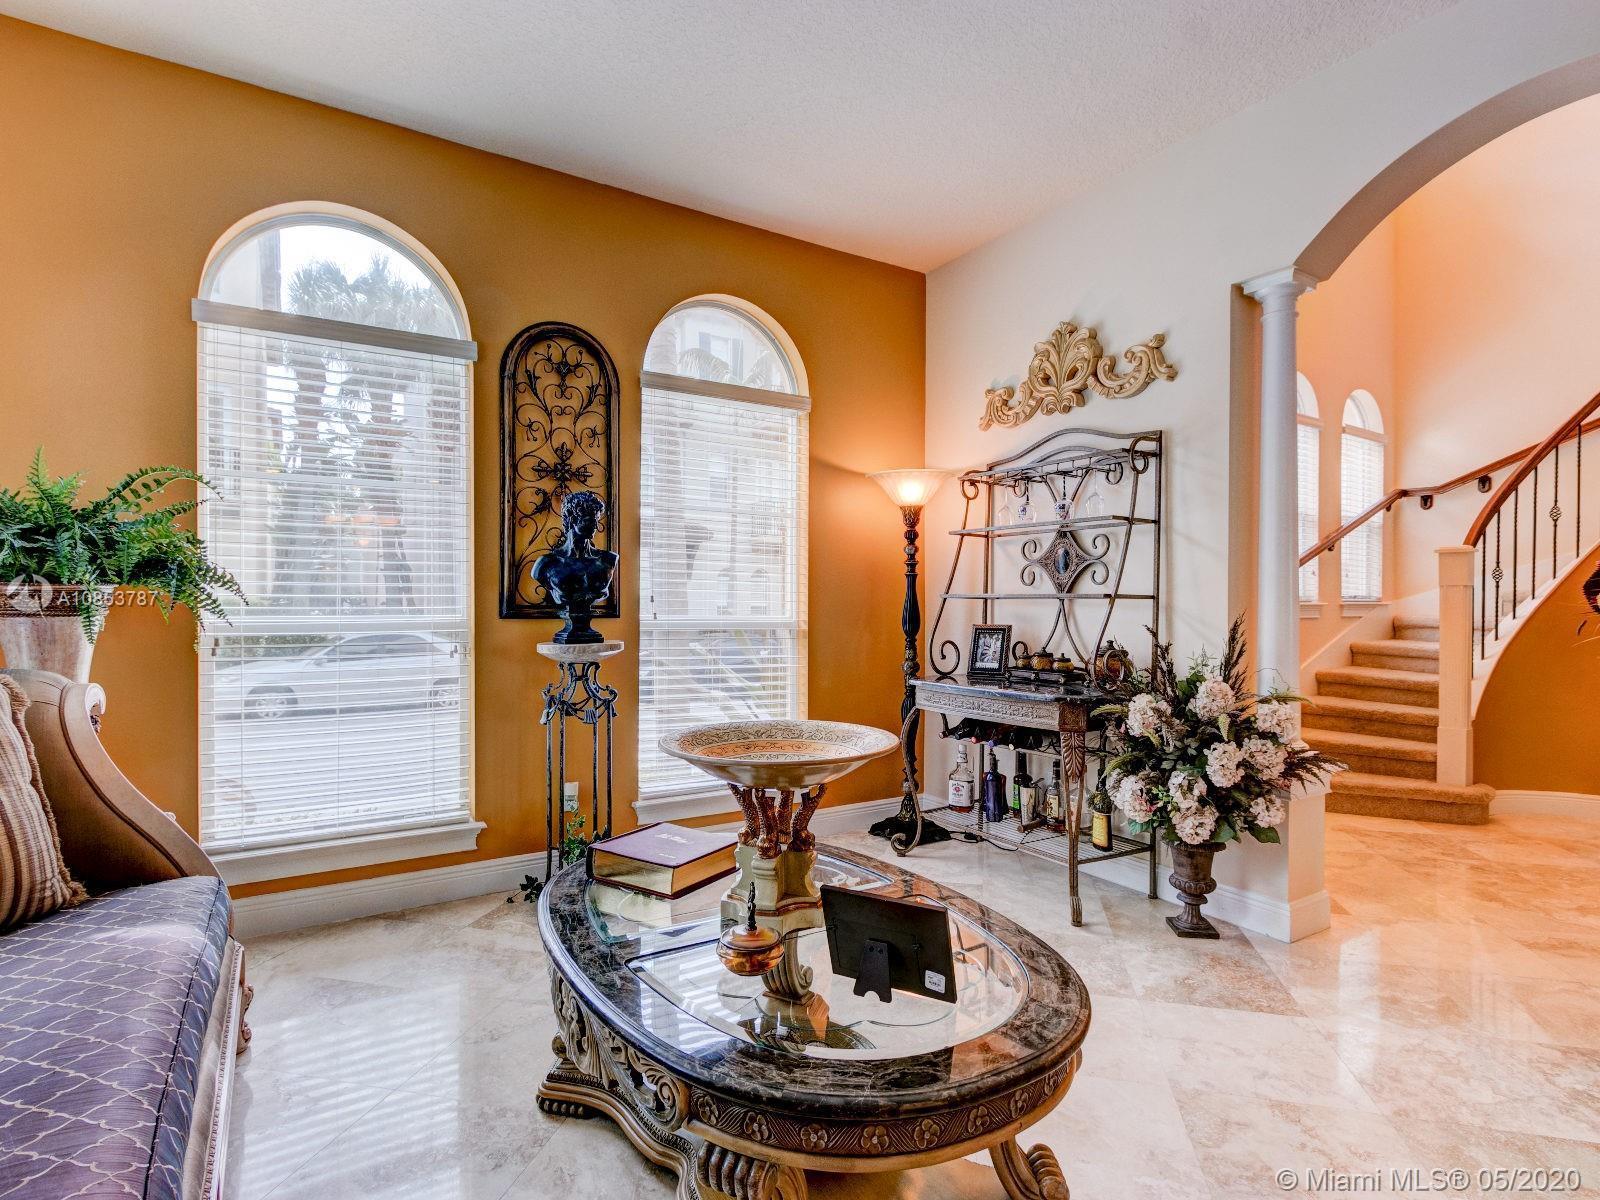 Corner Lot! Elegant east Boca home. Highly desired Solana model. Soaring 2 story foyer entrance with